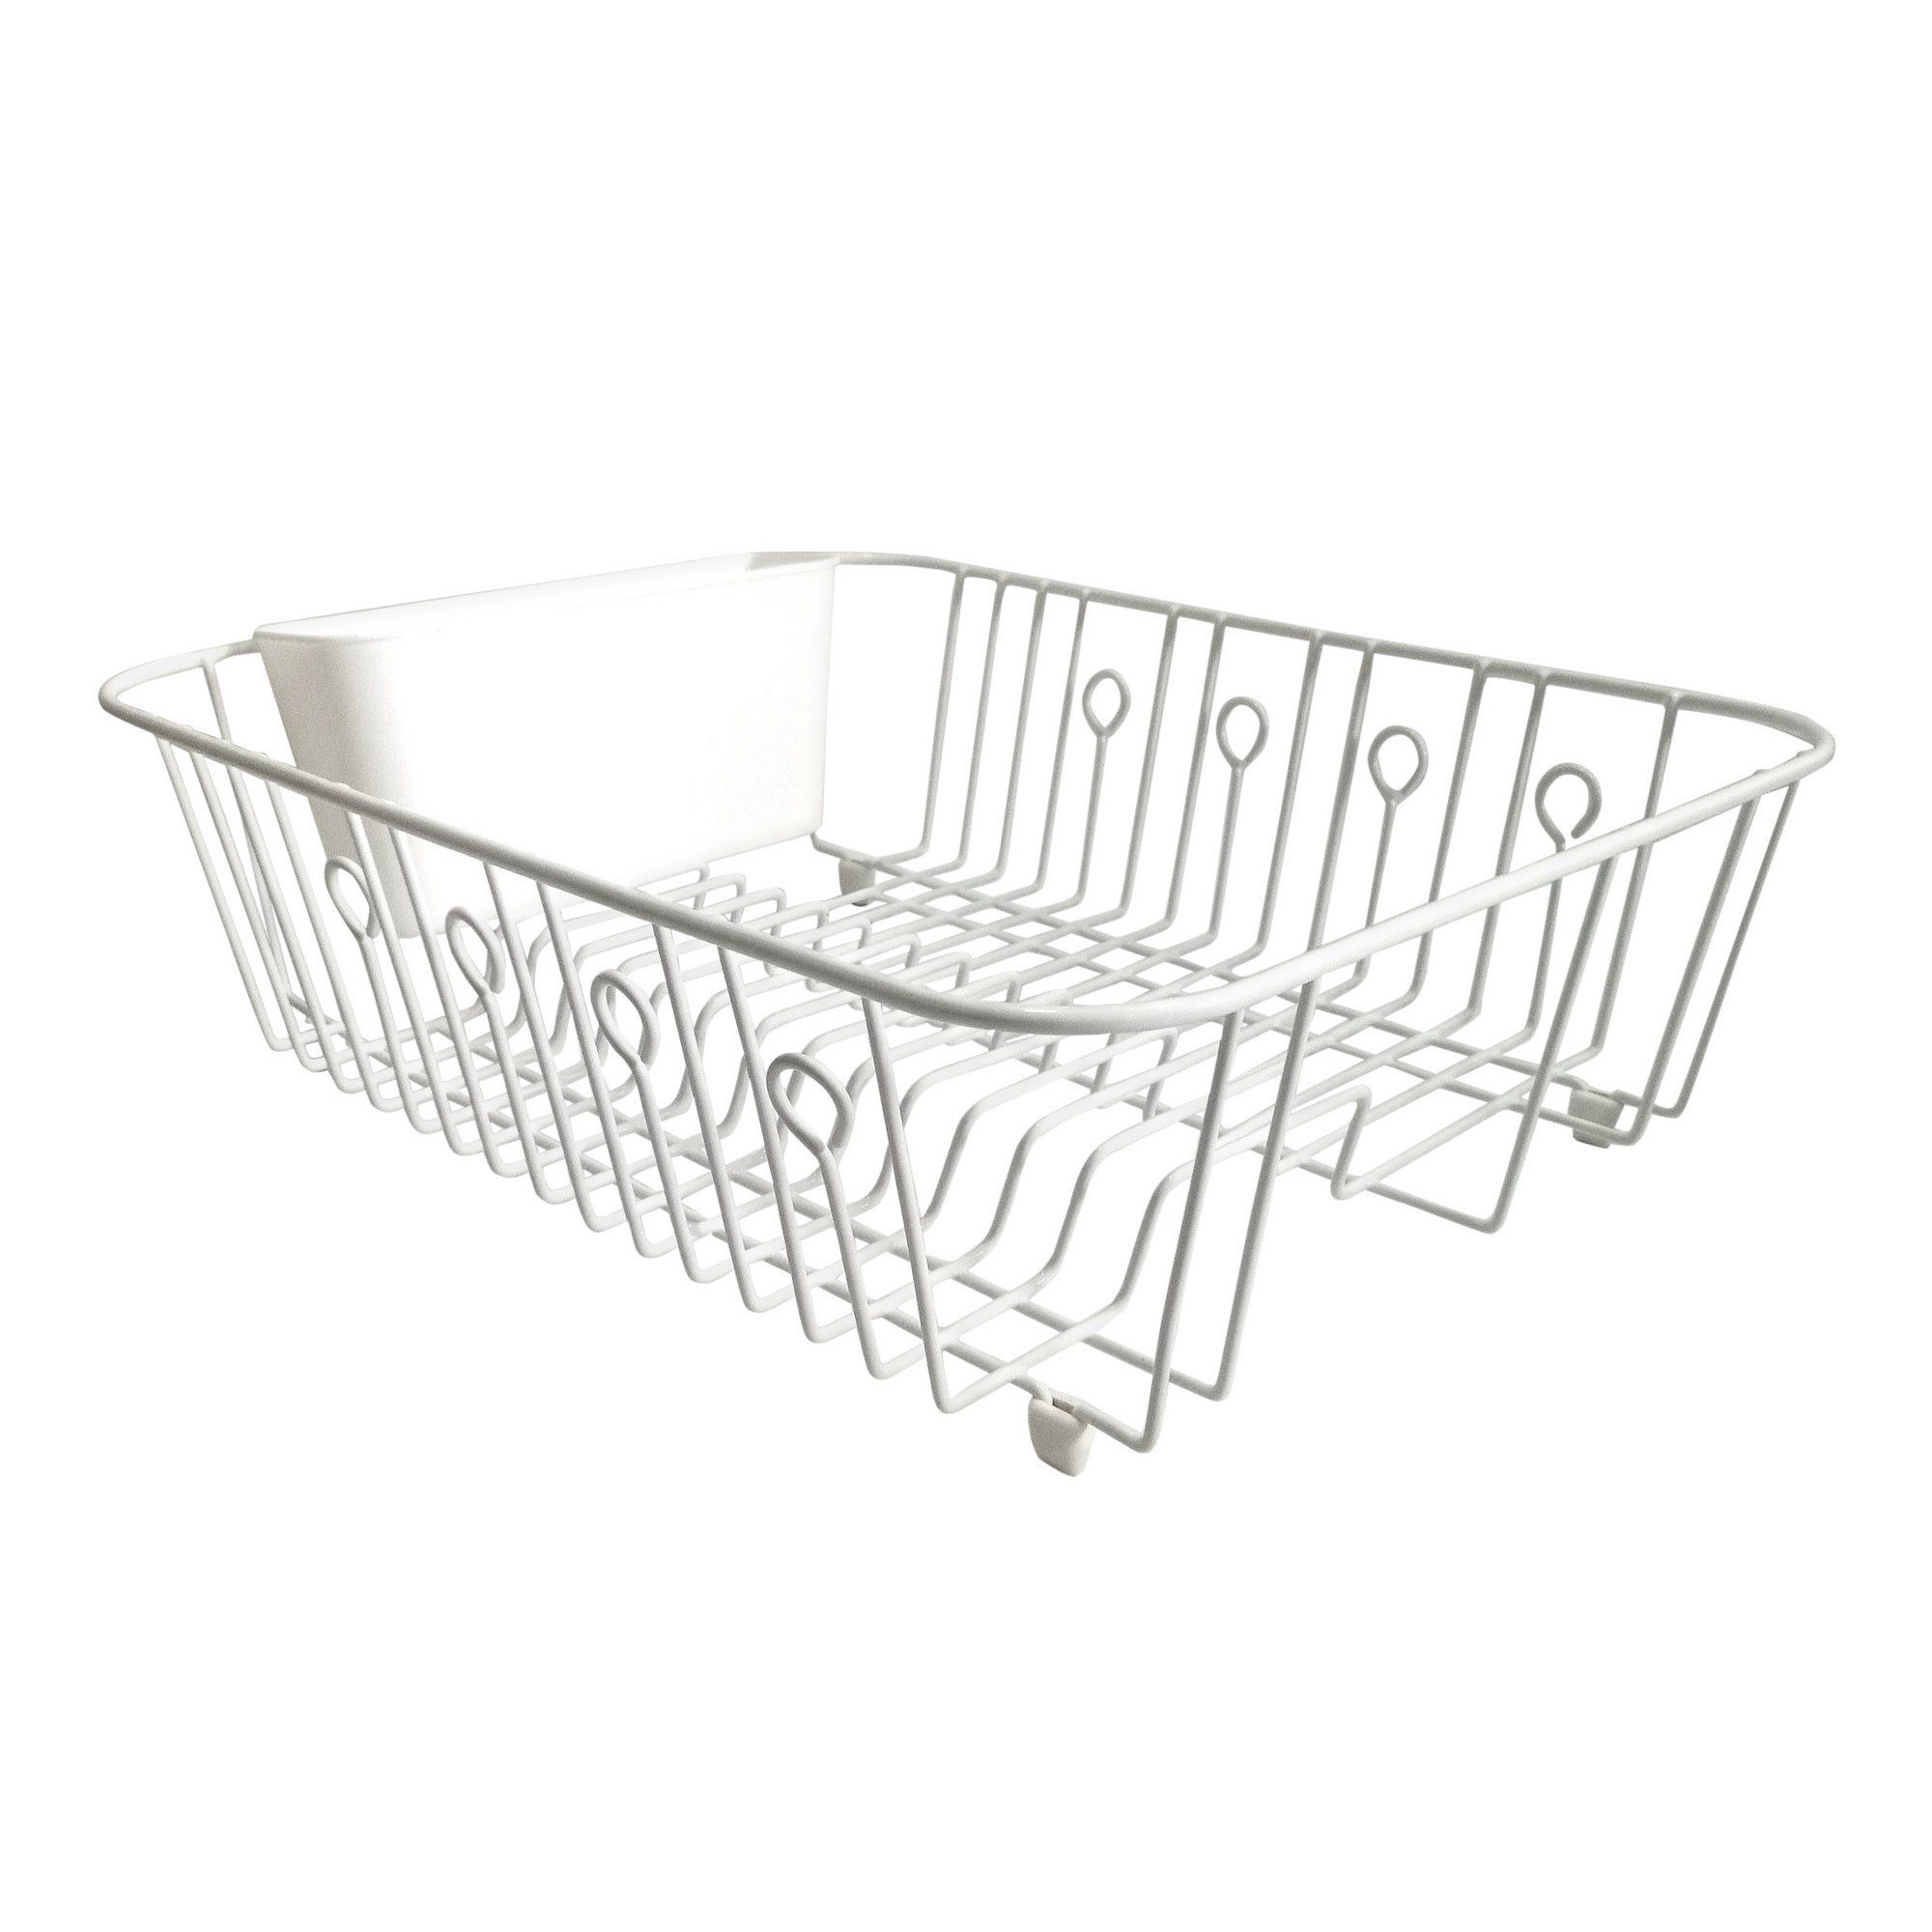 Target Dish Drying Rack Kitchen Storage Racks Holders And Dispensers White  Room